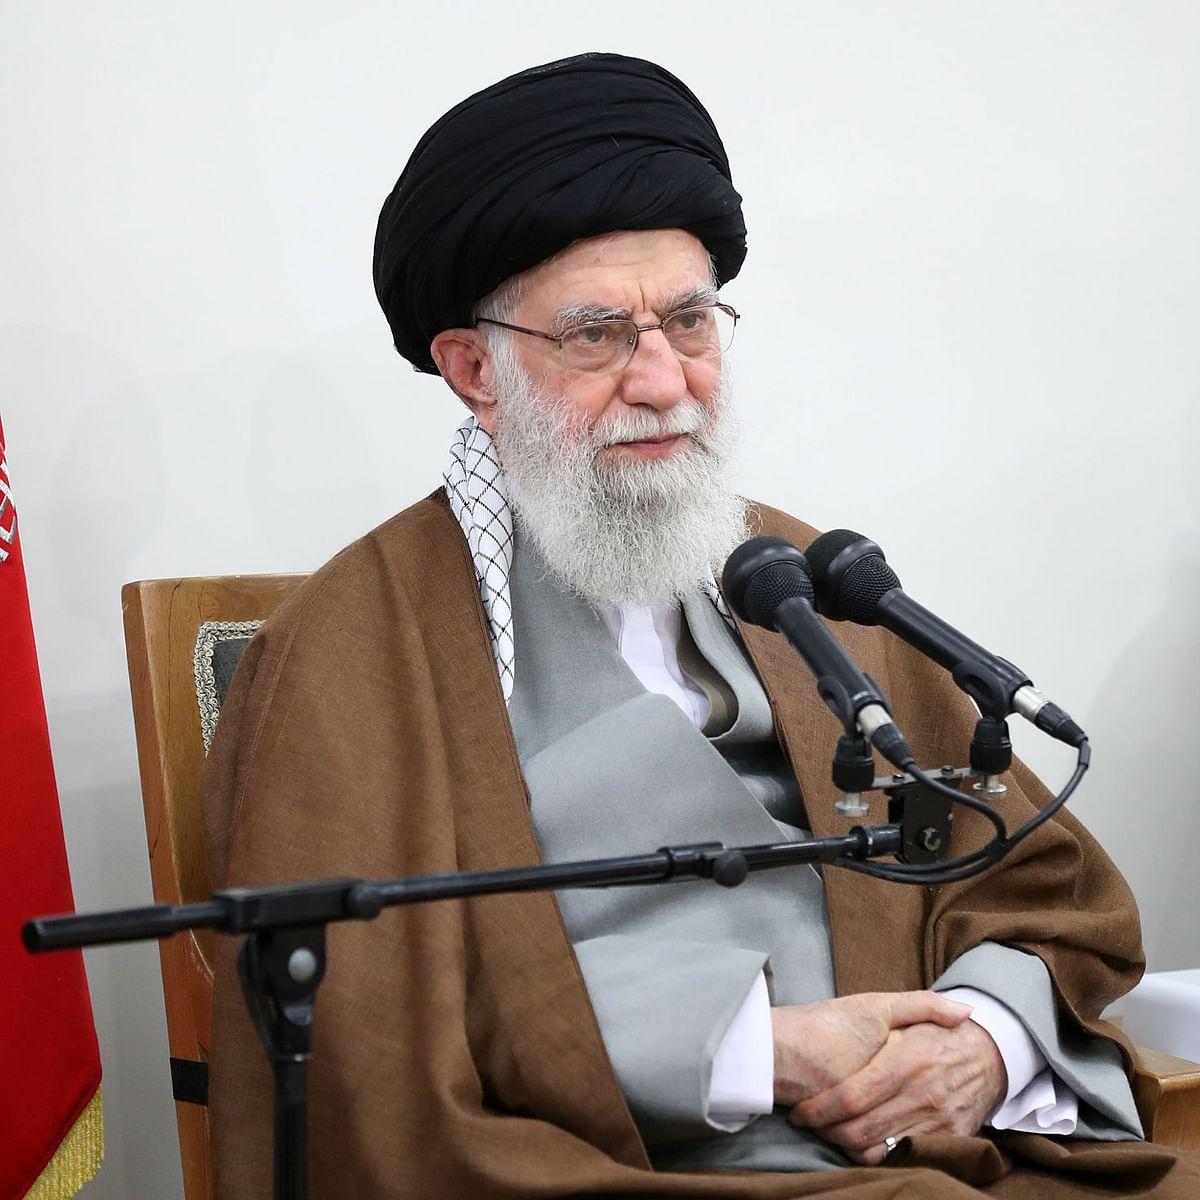 Iran's top leader calls Trump a 'clown' who will betray Iranians